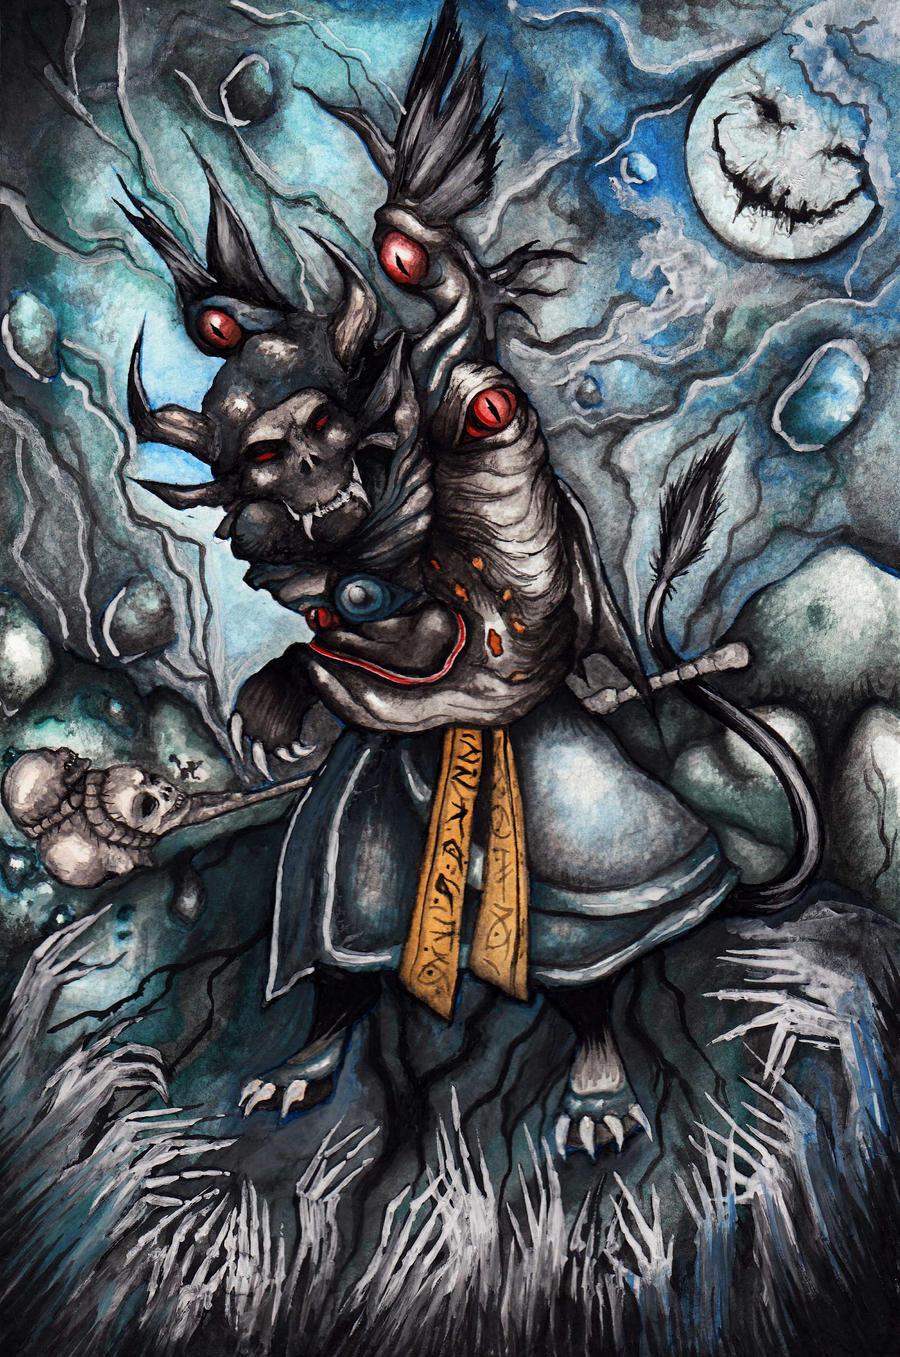 Gw2 Necromancer Art